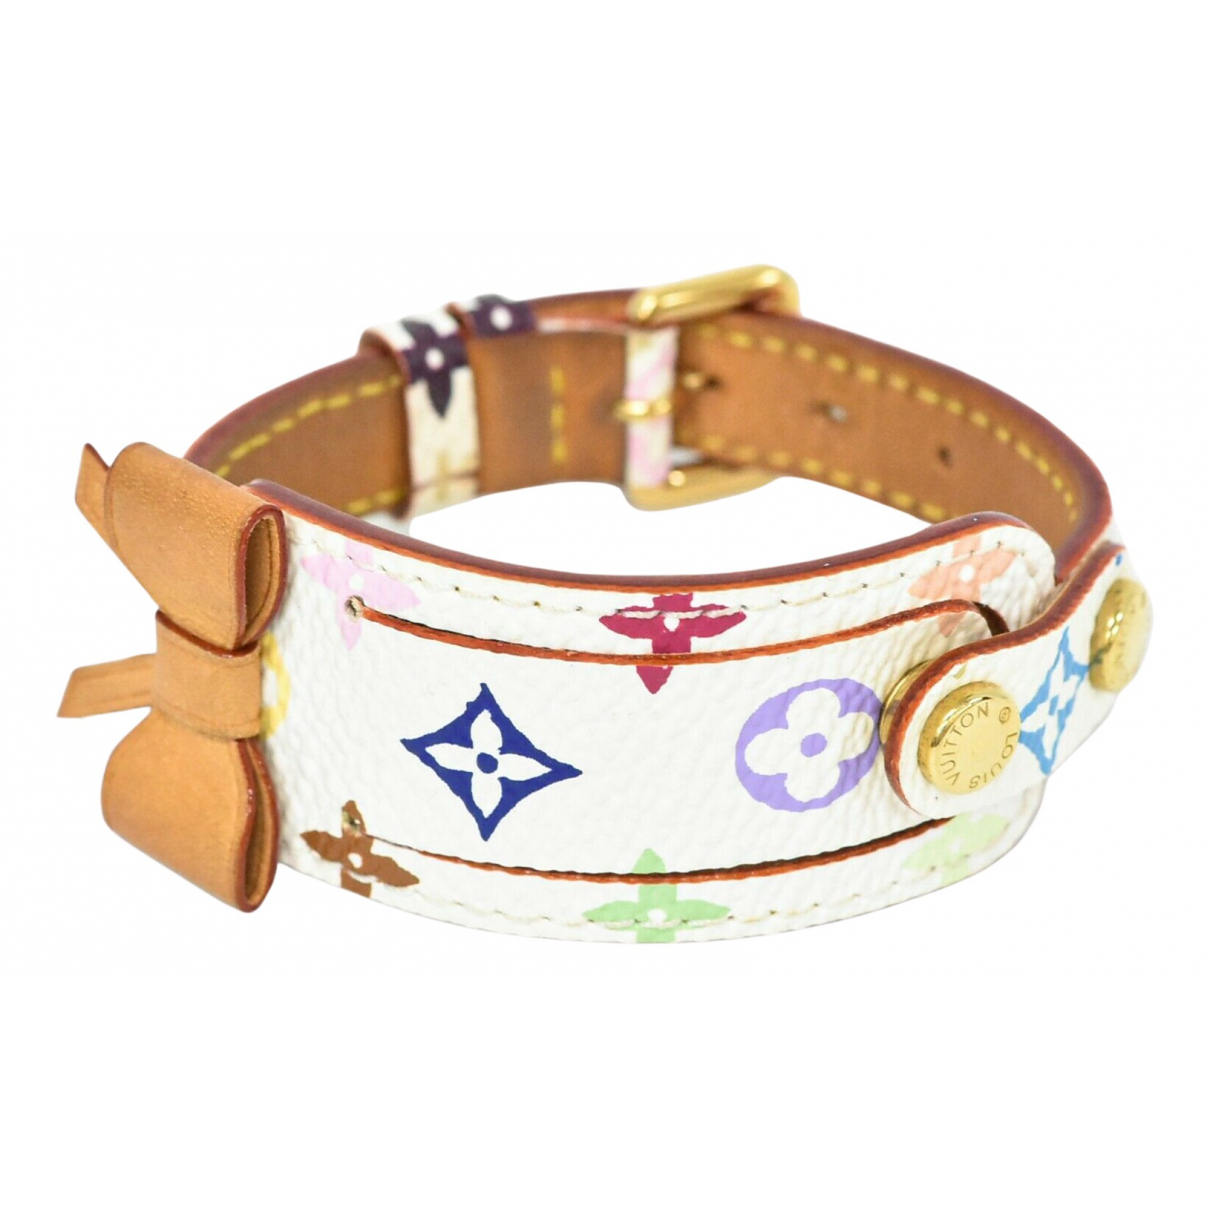 Louis Vuitton \N Armband in  Weiss Leinen